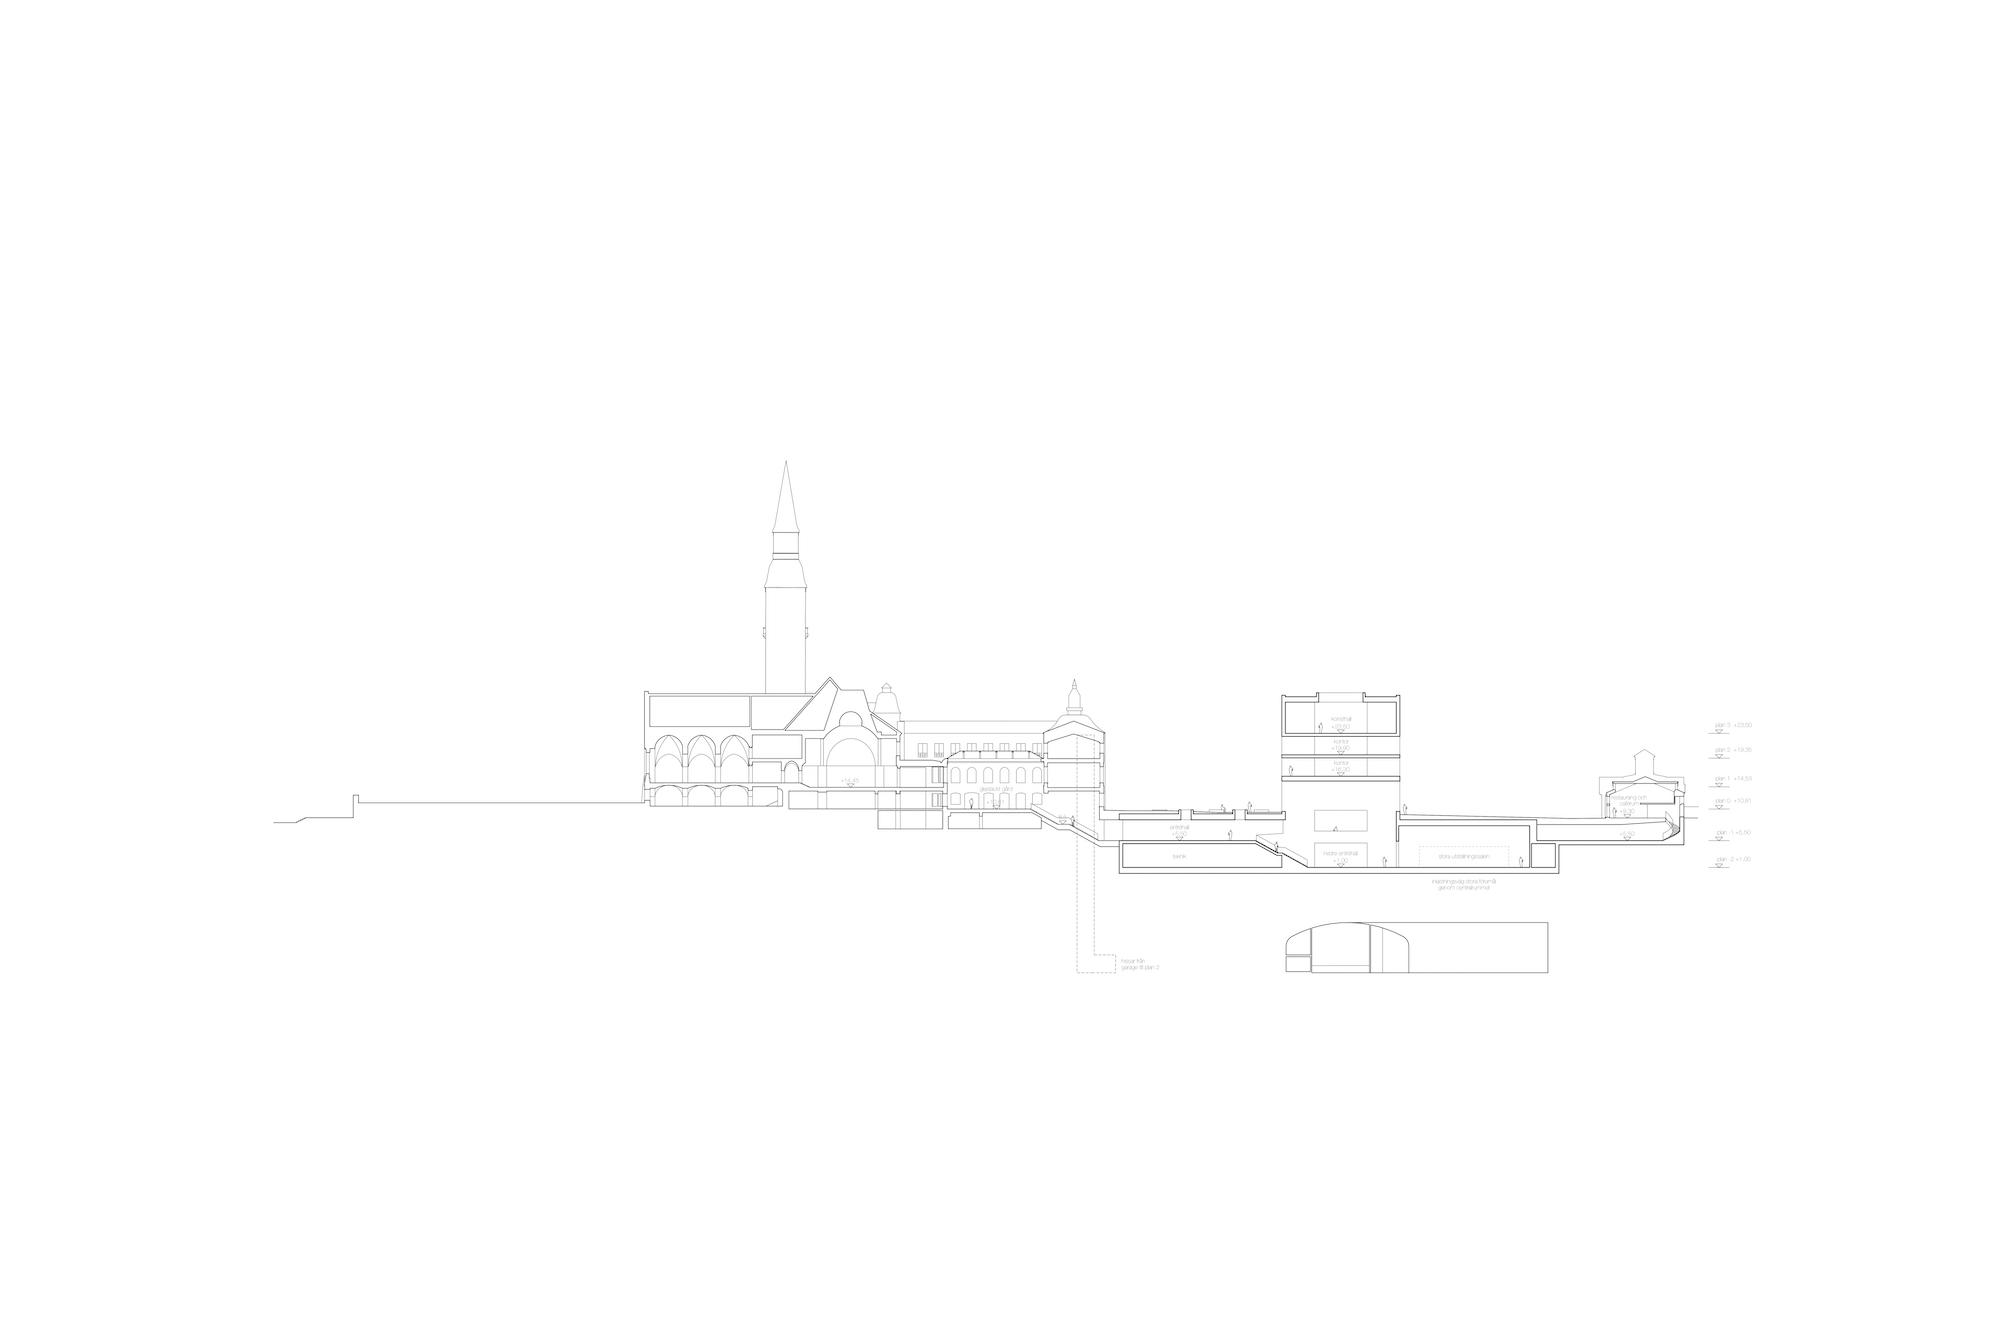 A-40.2-020 Sektion B-B.jpg